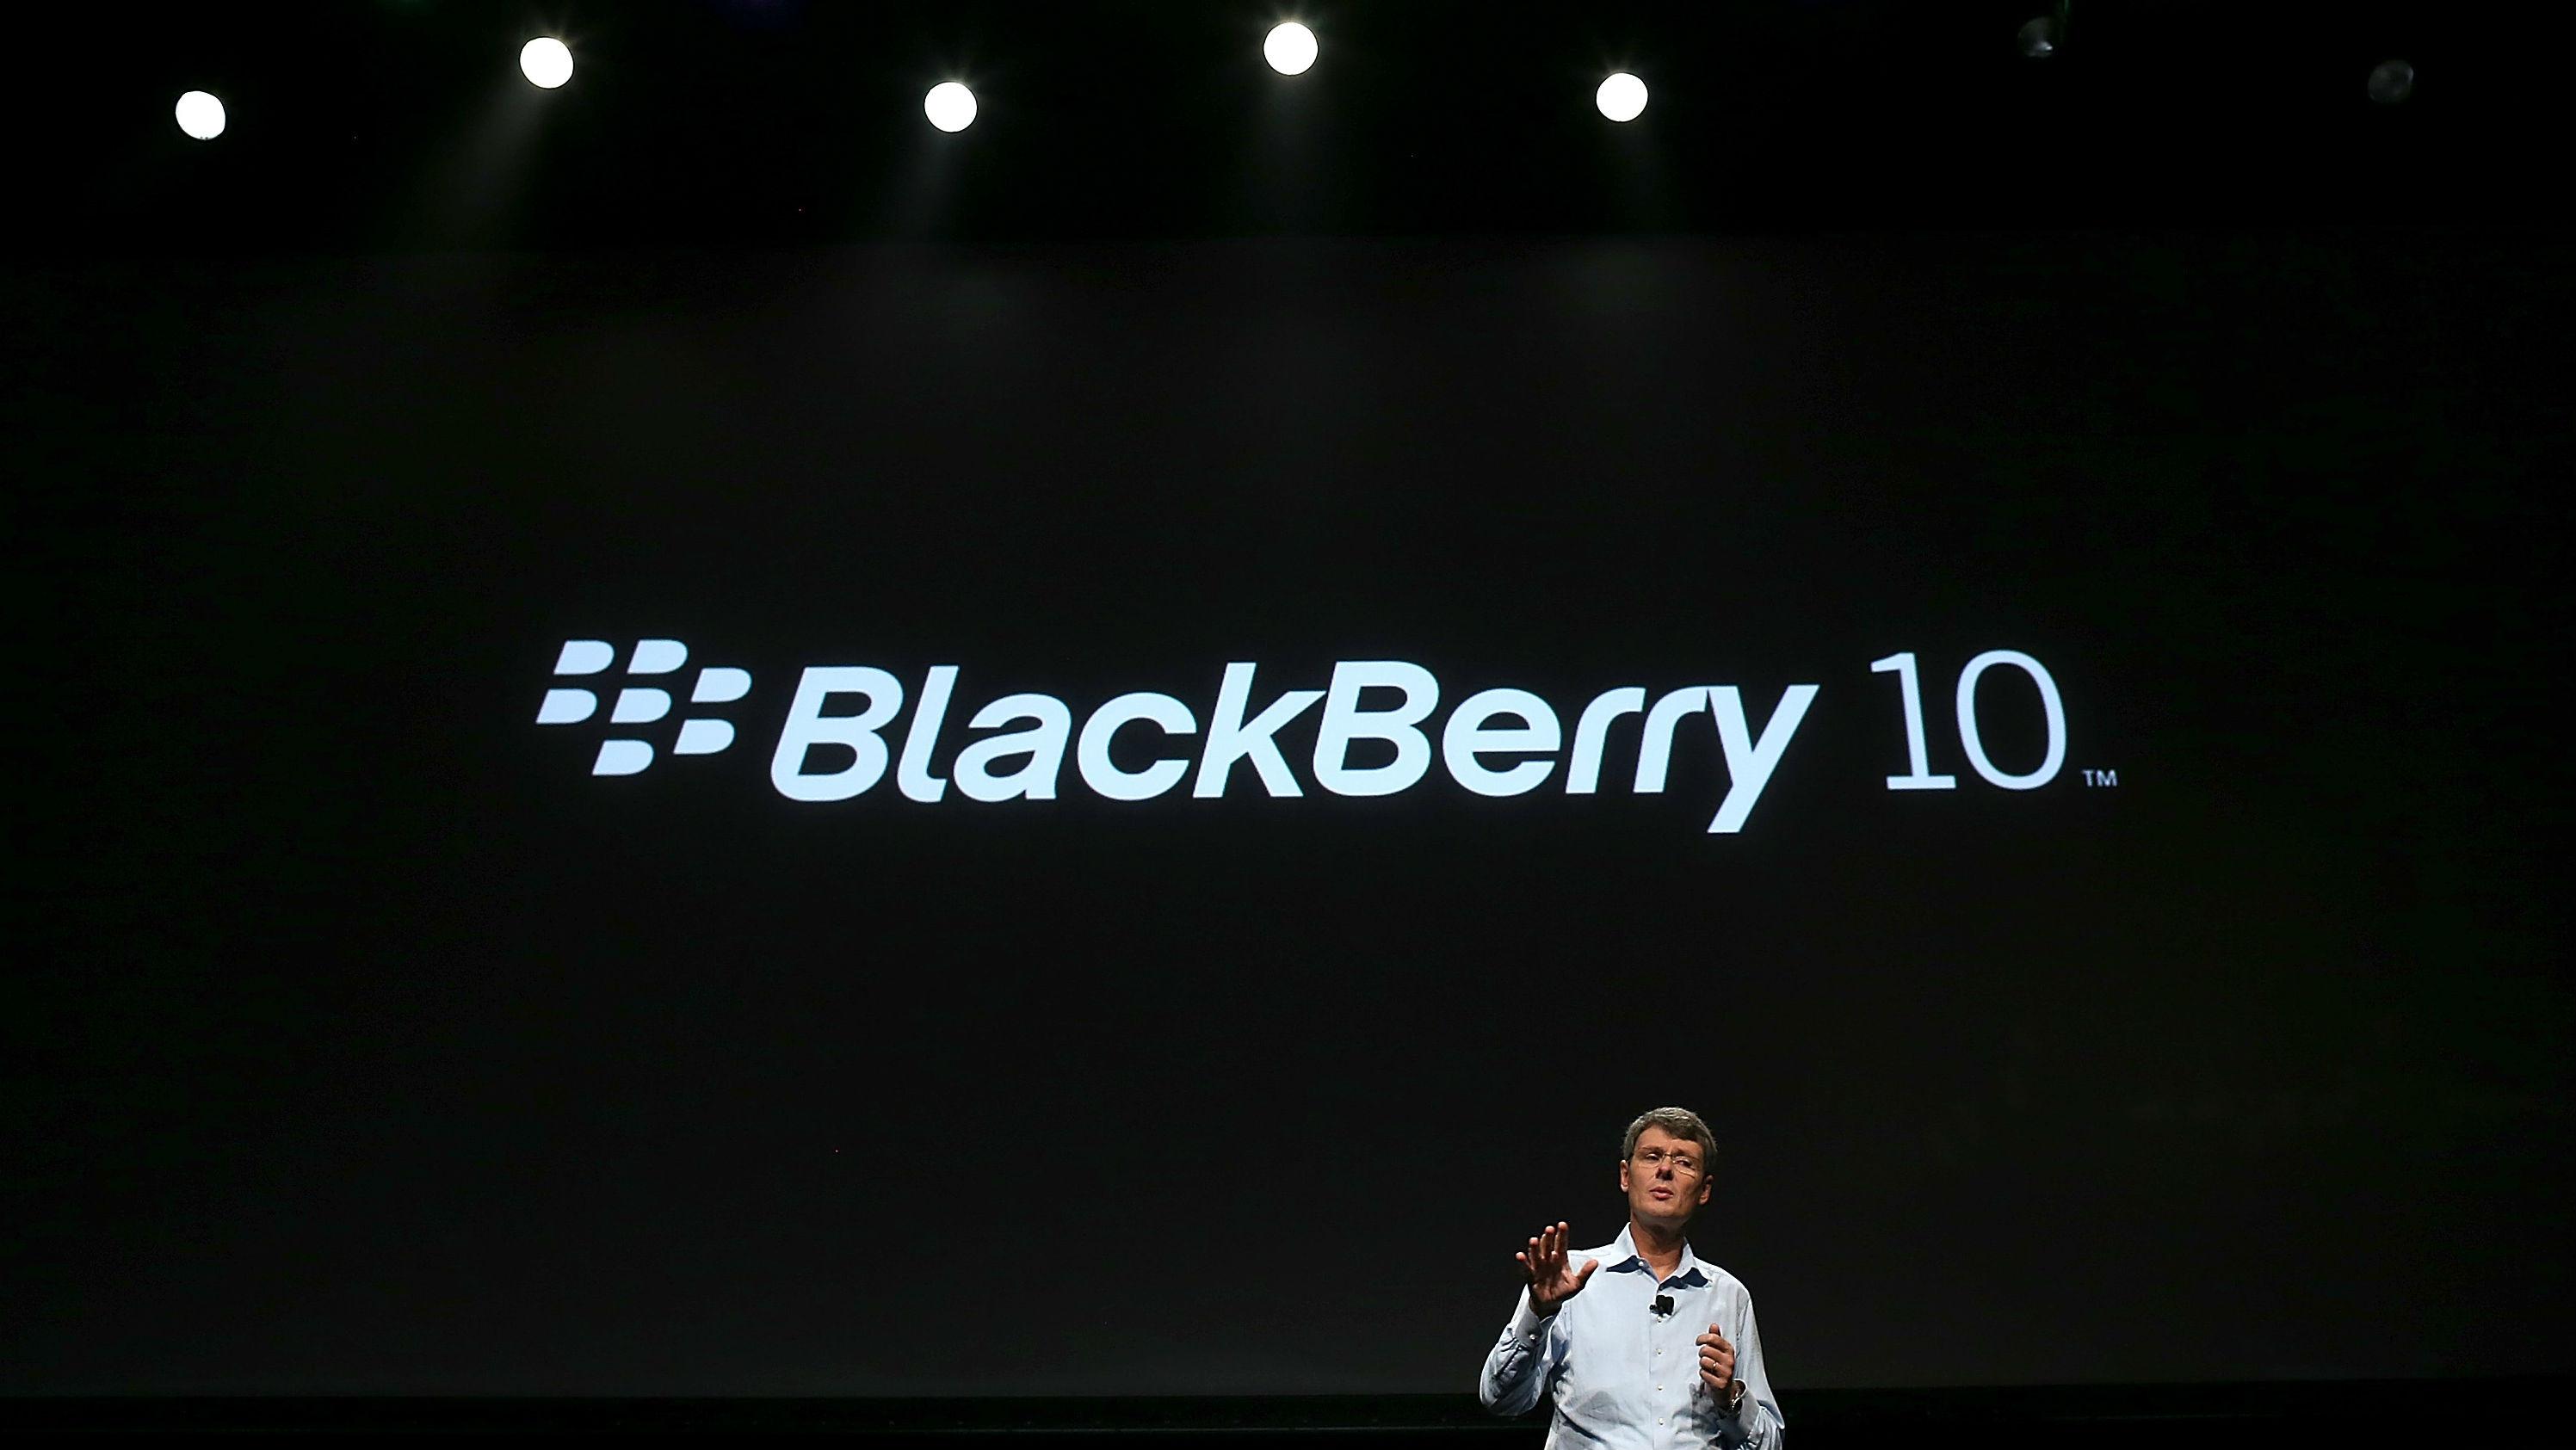 Blackberry Debut